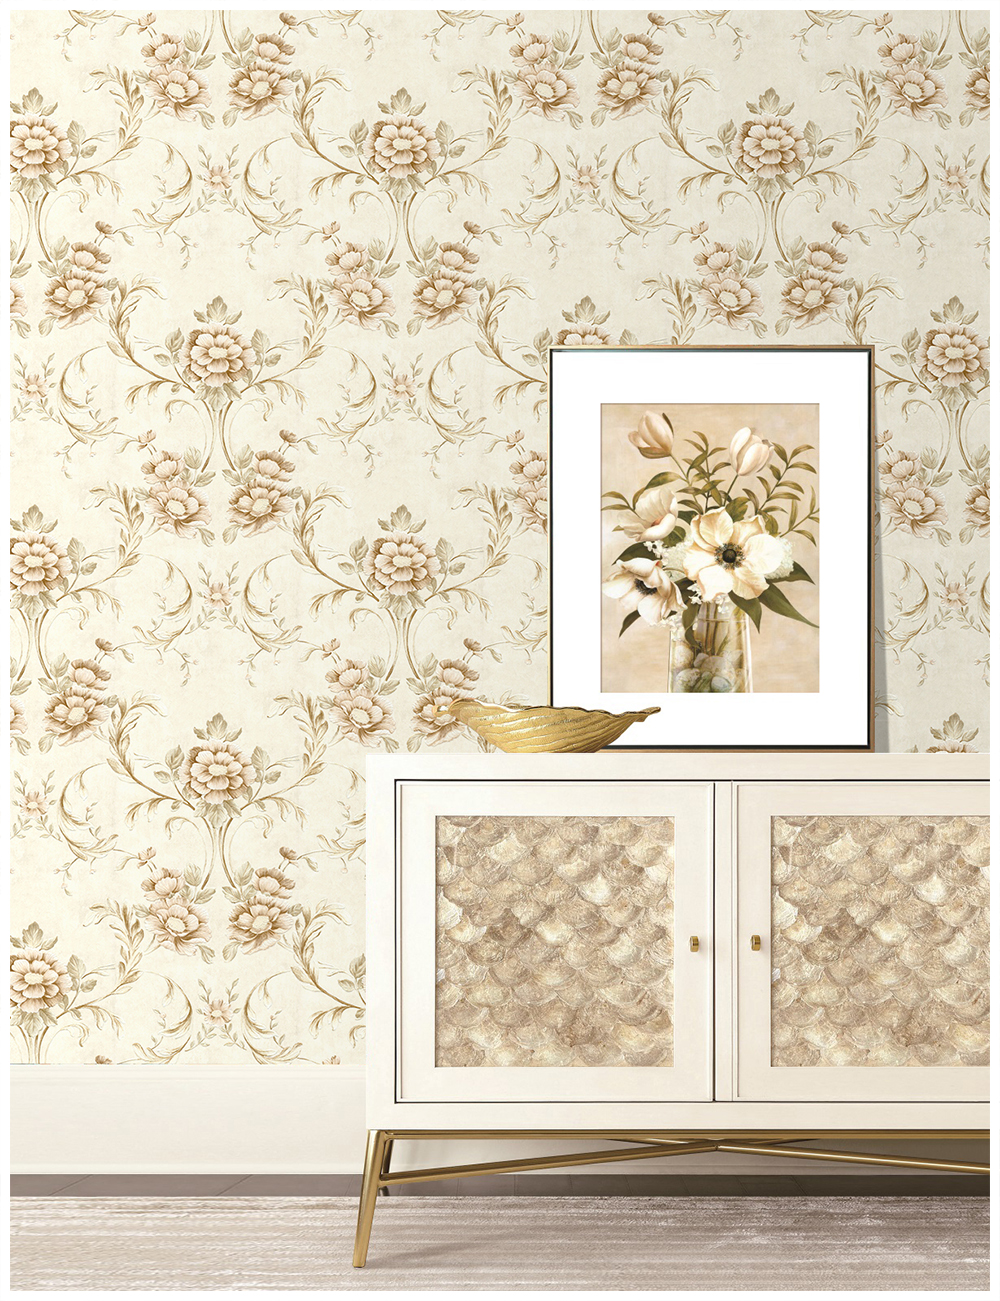 Haokhome Vintage Floral Wallpaper European Style 0 53m 10m Beige